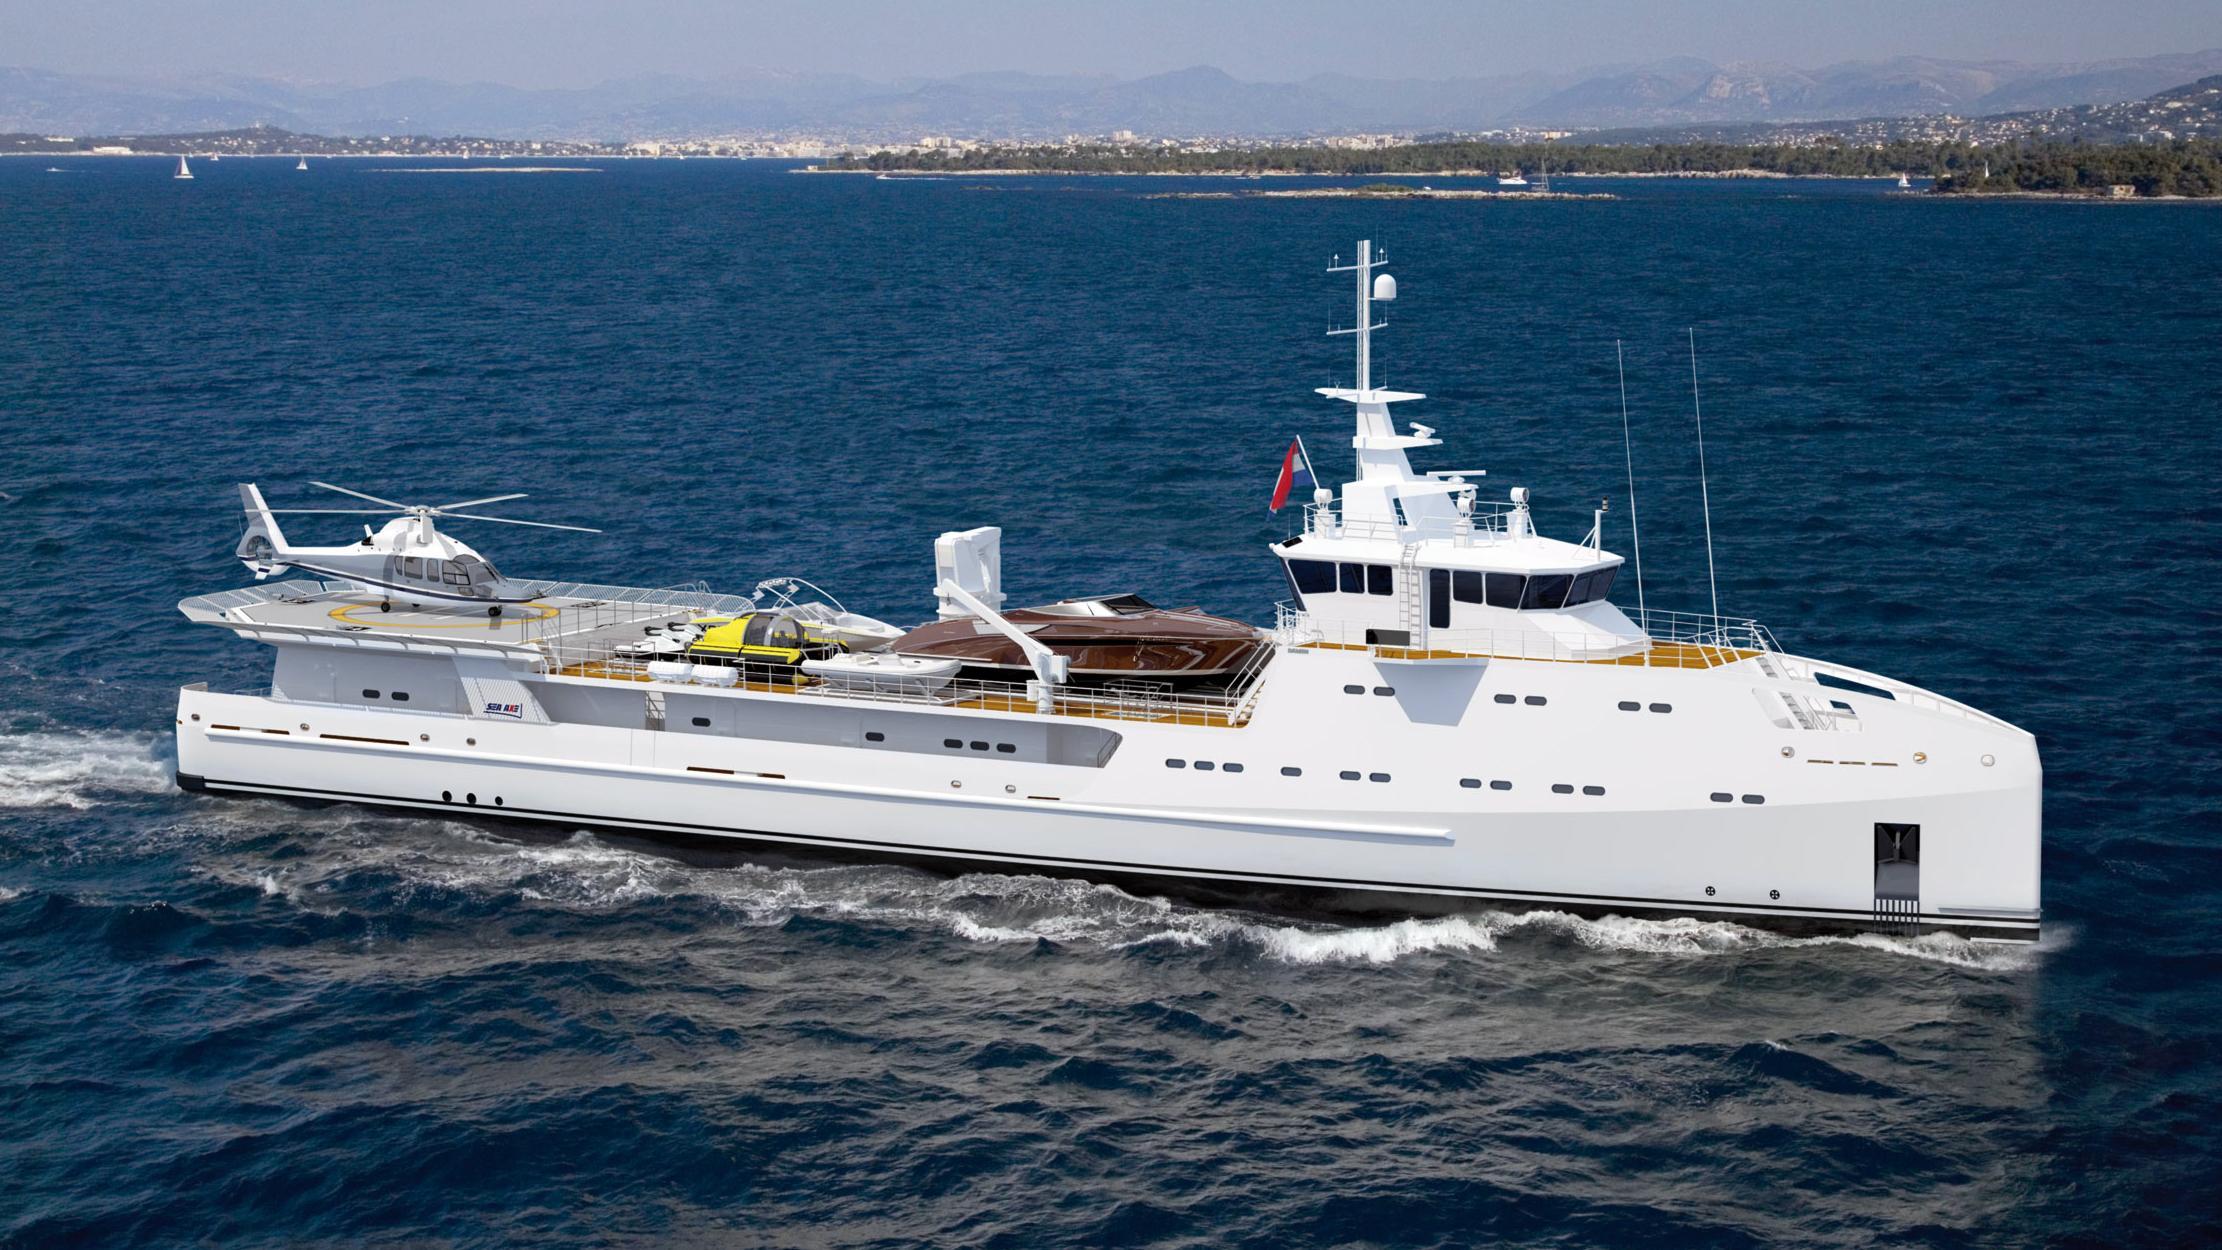 intrepid-motoryacht-damen-sea-axe-6911-2016-69m-rendering